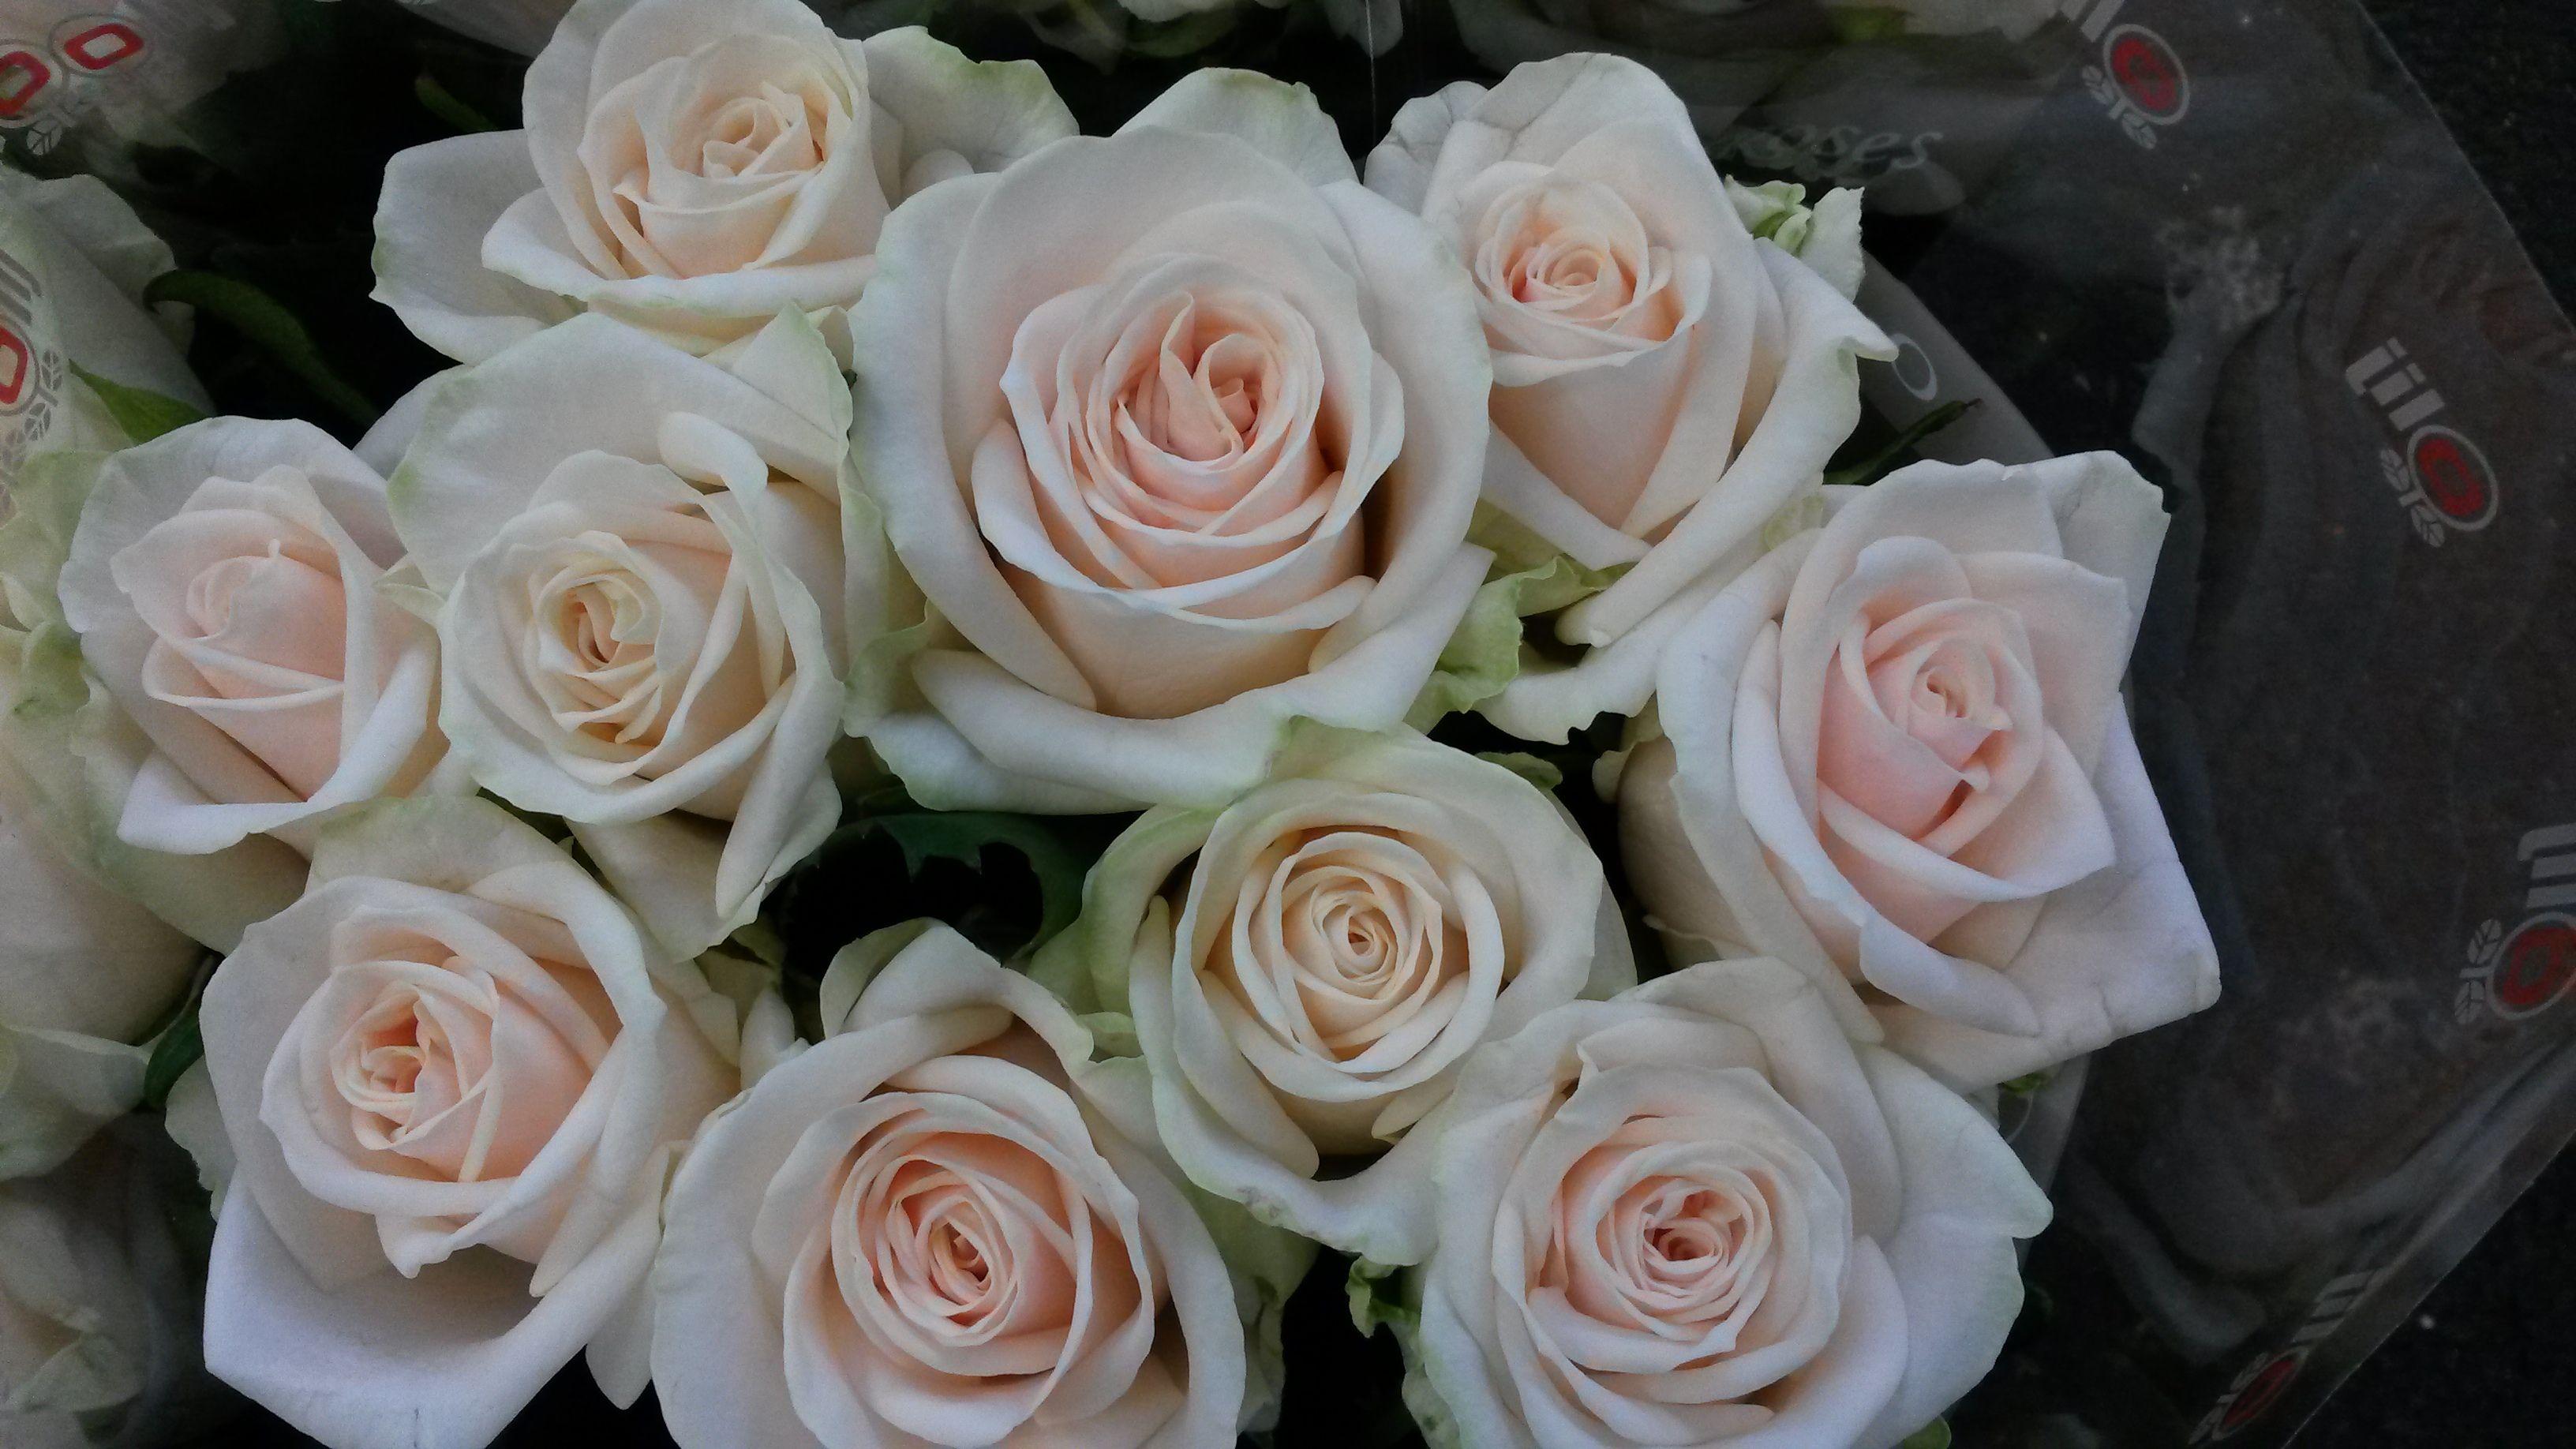 Rose Rosa Mylenna; Available at www.barendsenl.nl